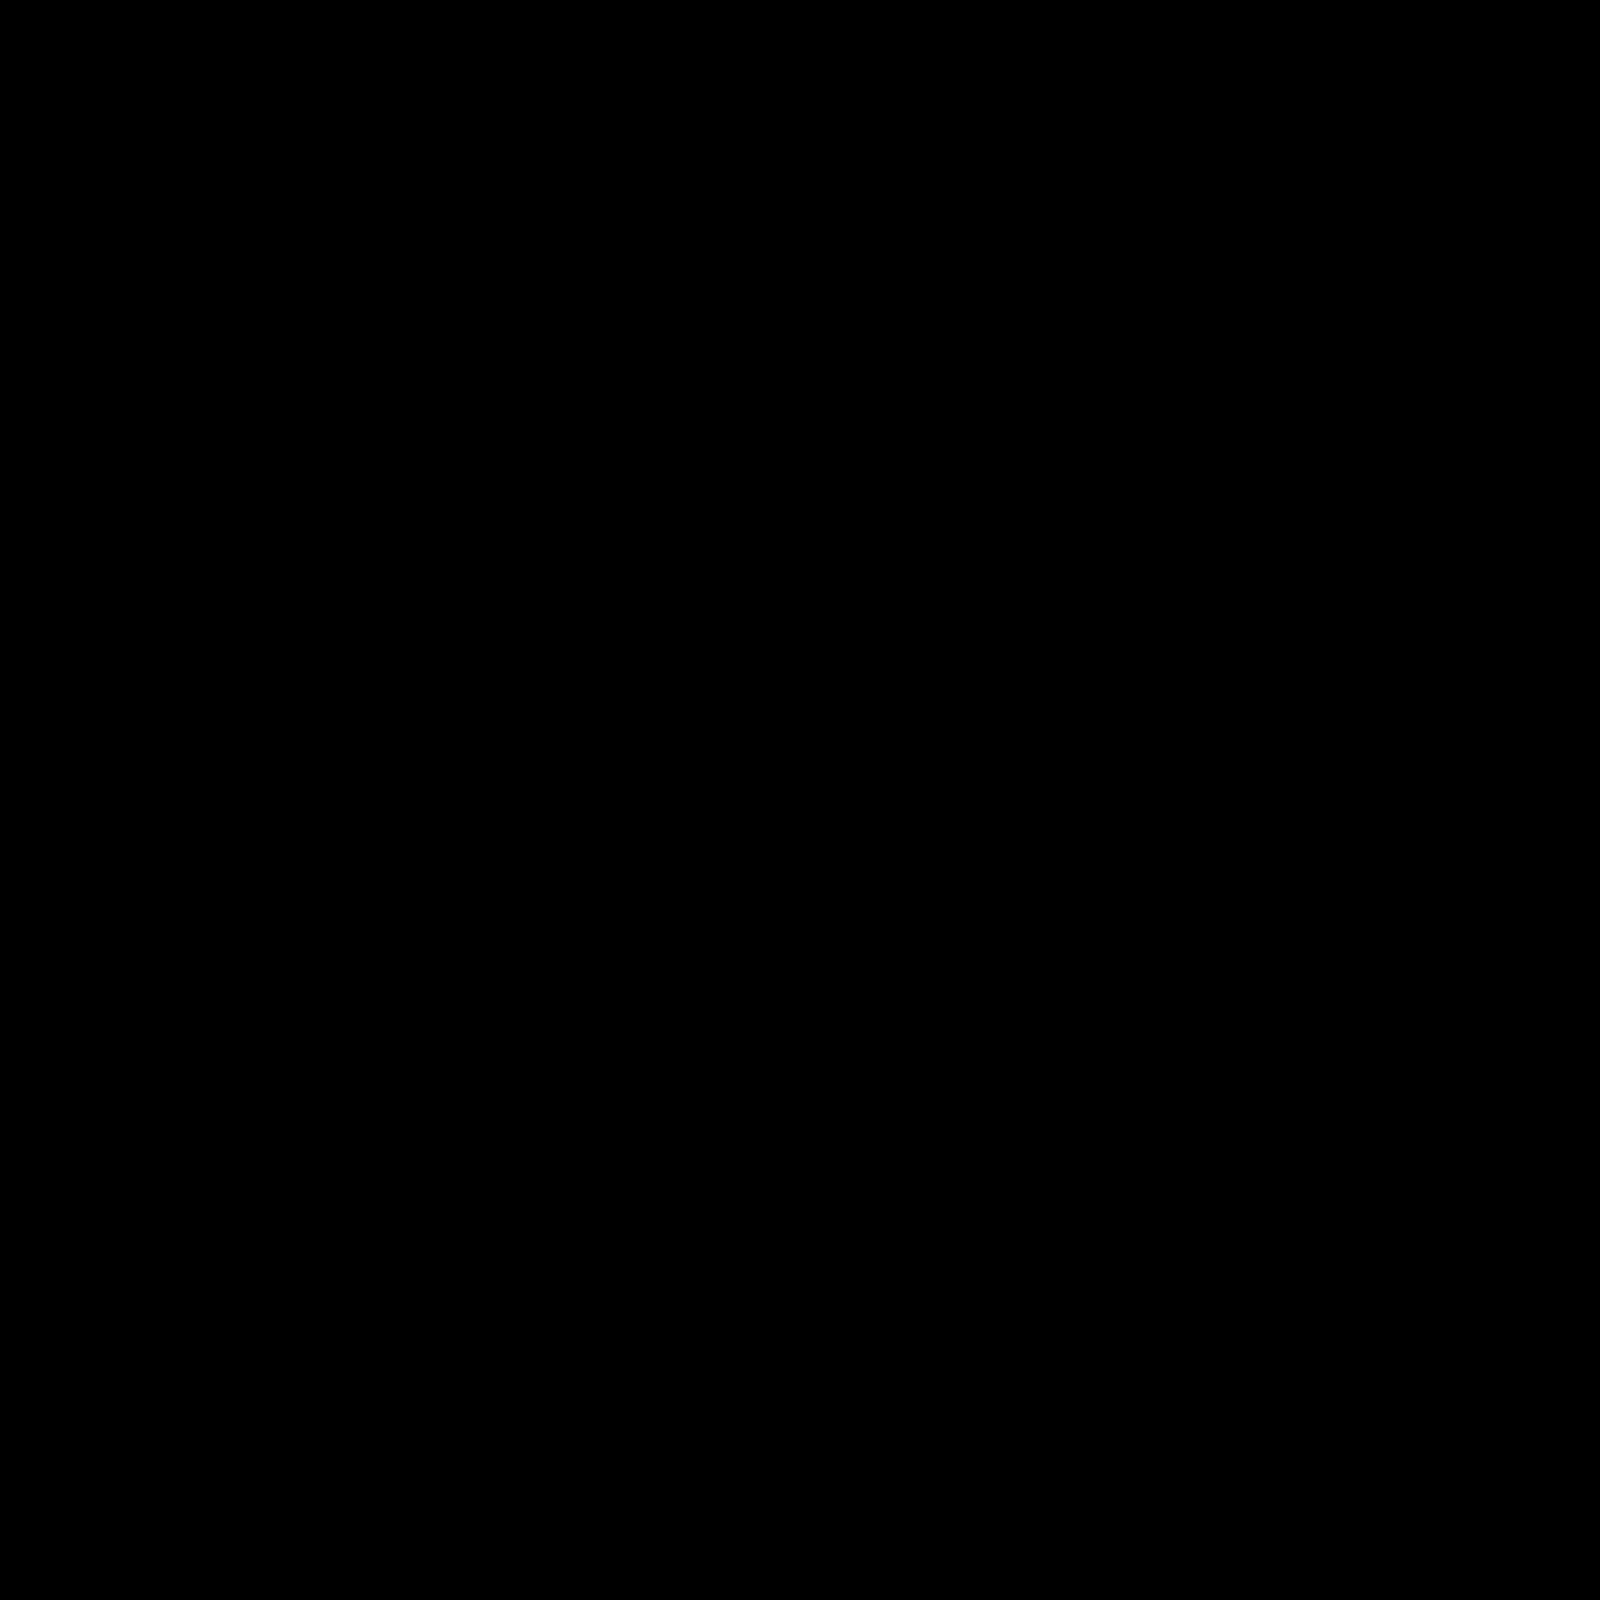 Phone Keys Filled icon